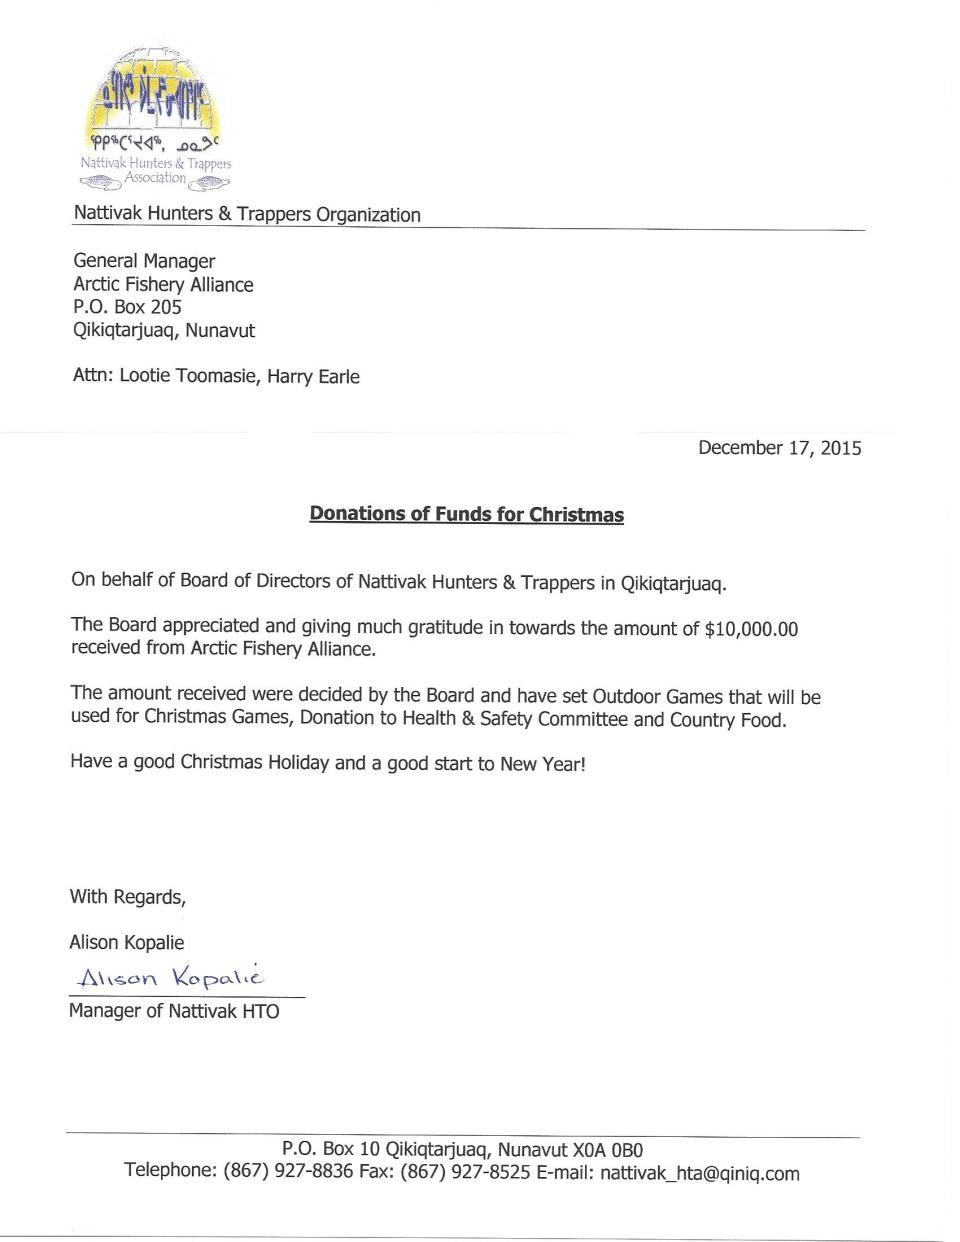 Letter to AFA from Nattivak HTO